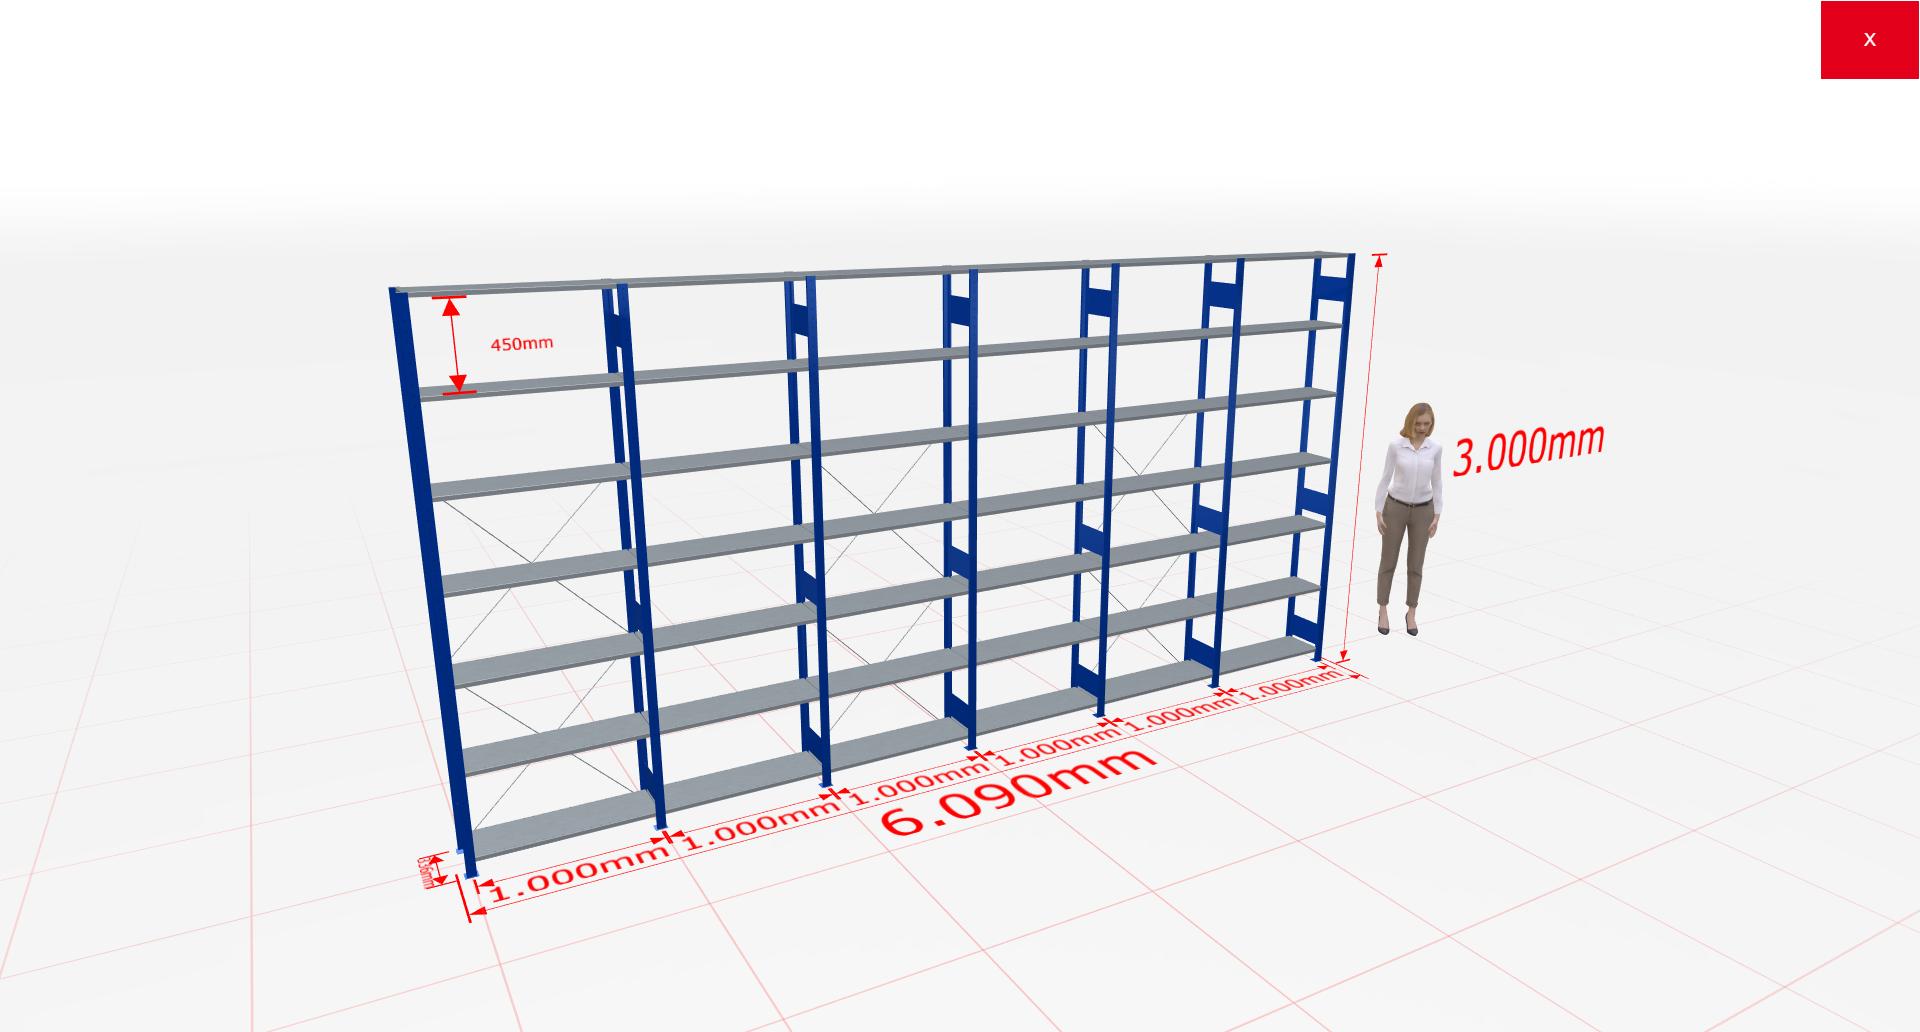 Fachbodenregal Komplettregal 3000x6090x300 mm (HxBxT) SCHULTE Lagertechnik blau 7 Ebenen  150 kg je Boden